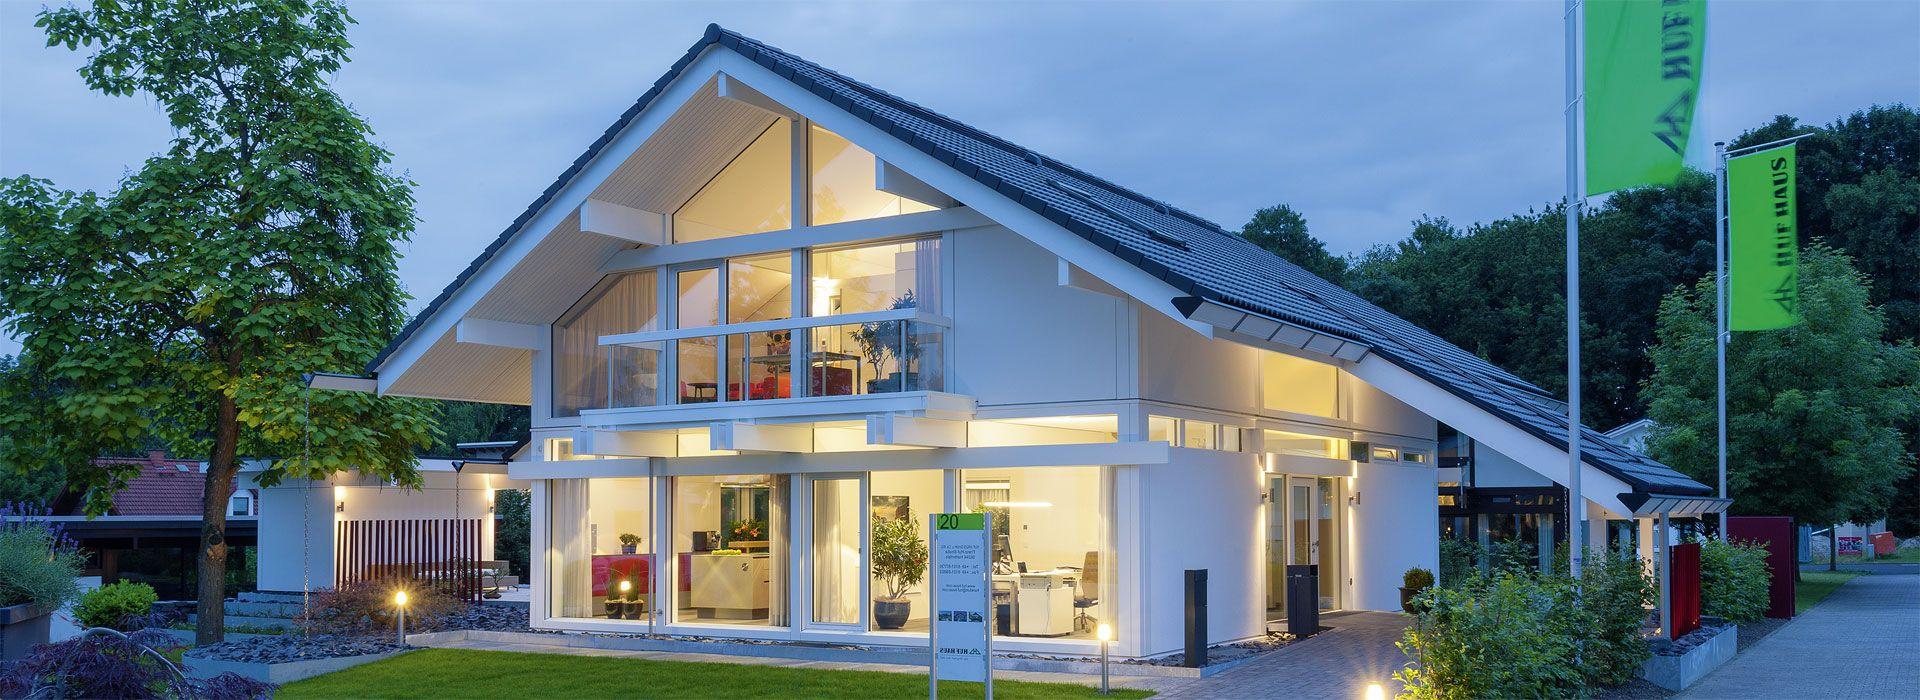 Casa prefabbricata huf haus art 4 prefab house huf haus for Comprare casa prefabbricata